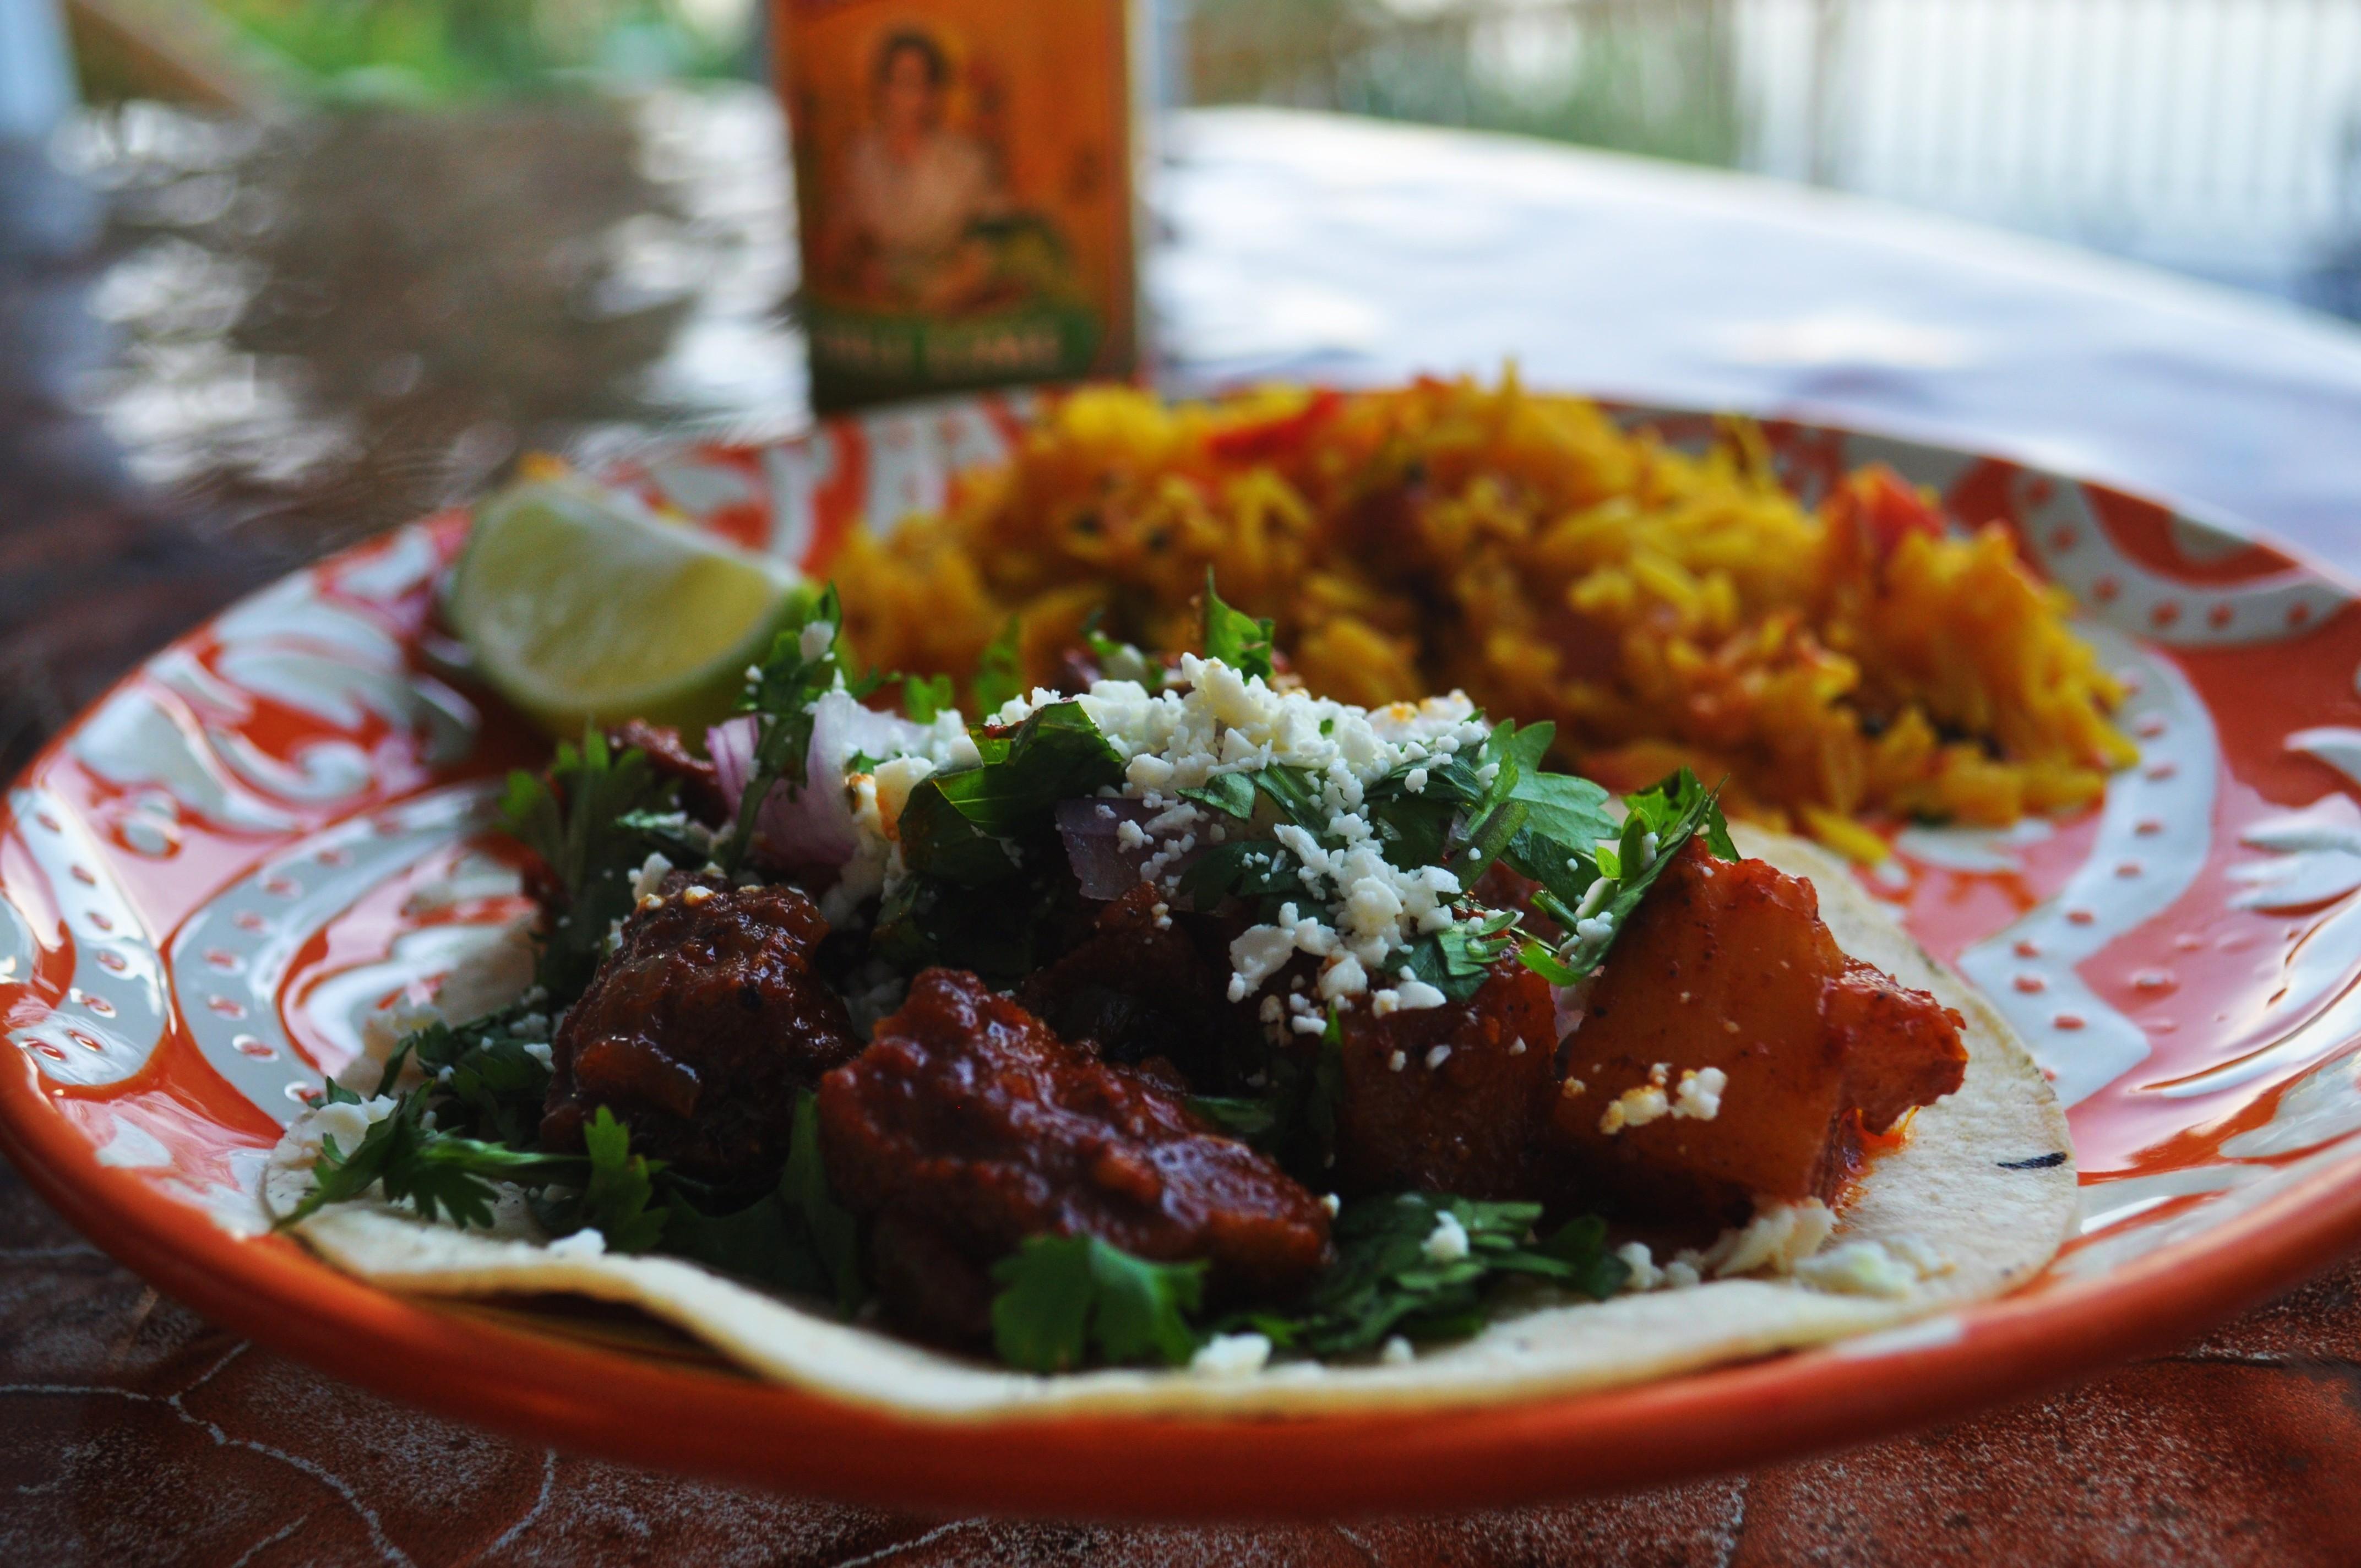 tacos al pastor the sassy spoon fun food. Black Bedroom Furniture Sets. Home Design Ideas